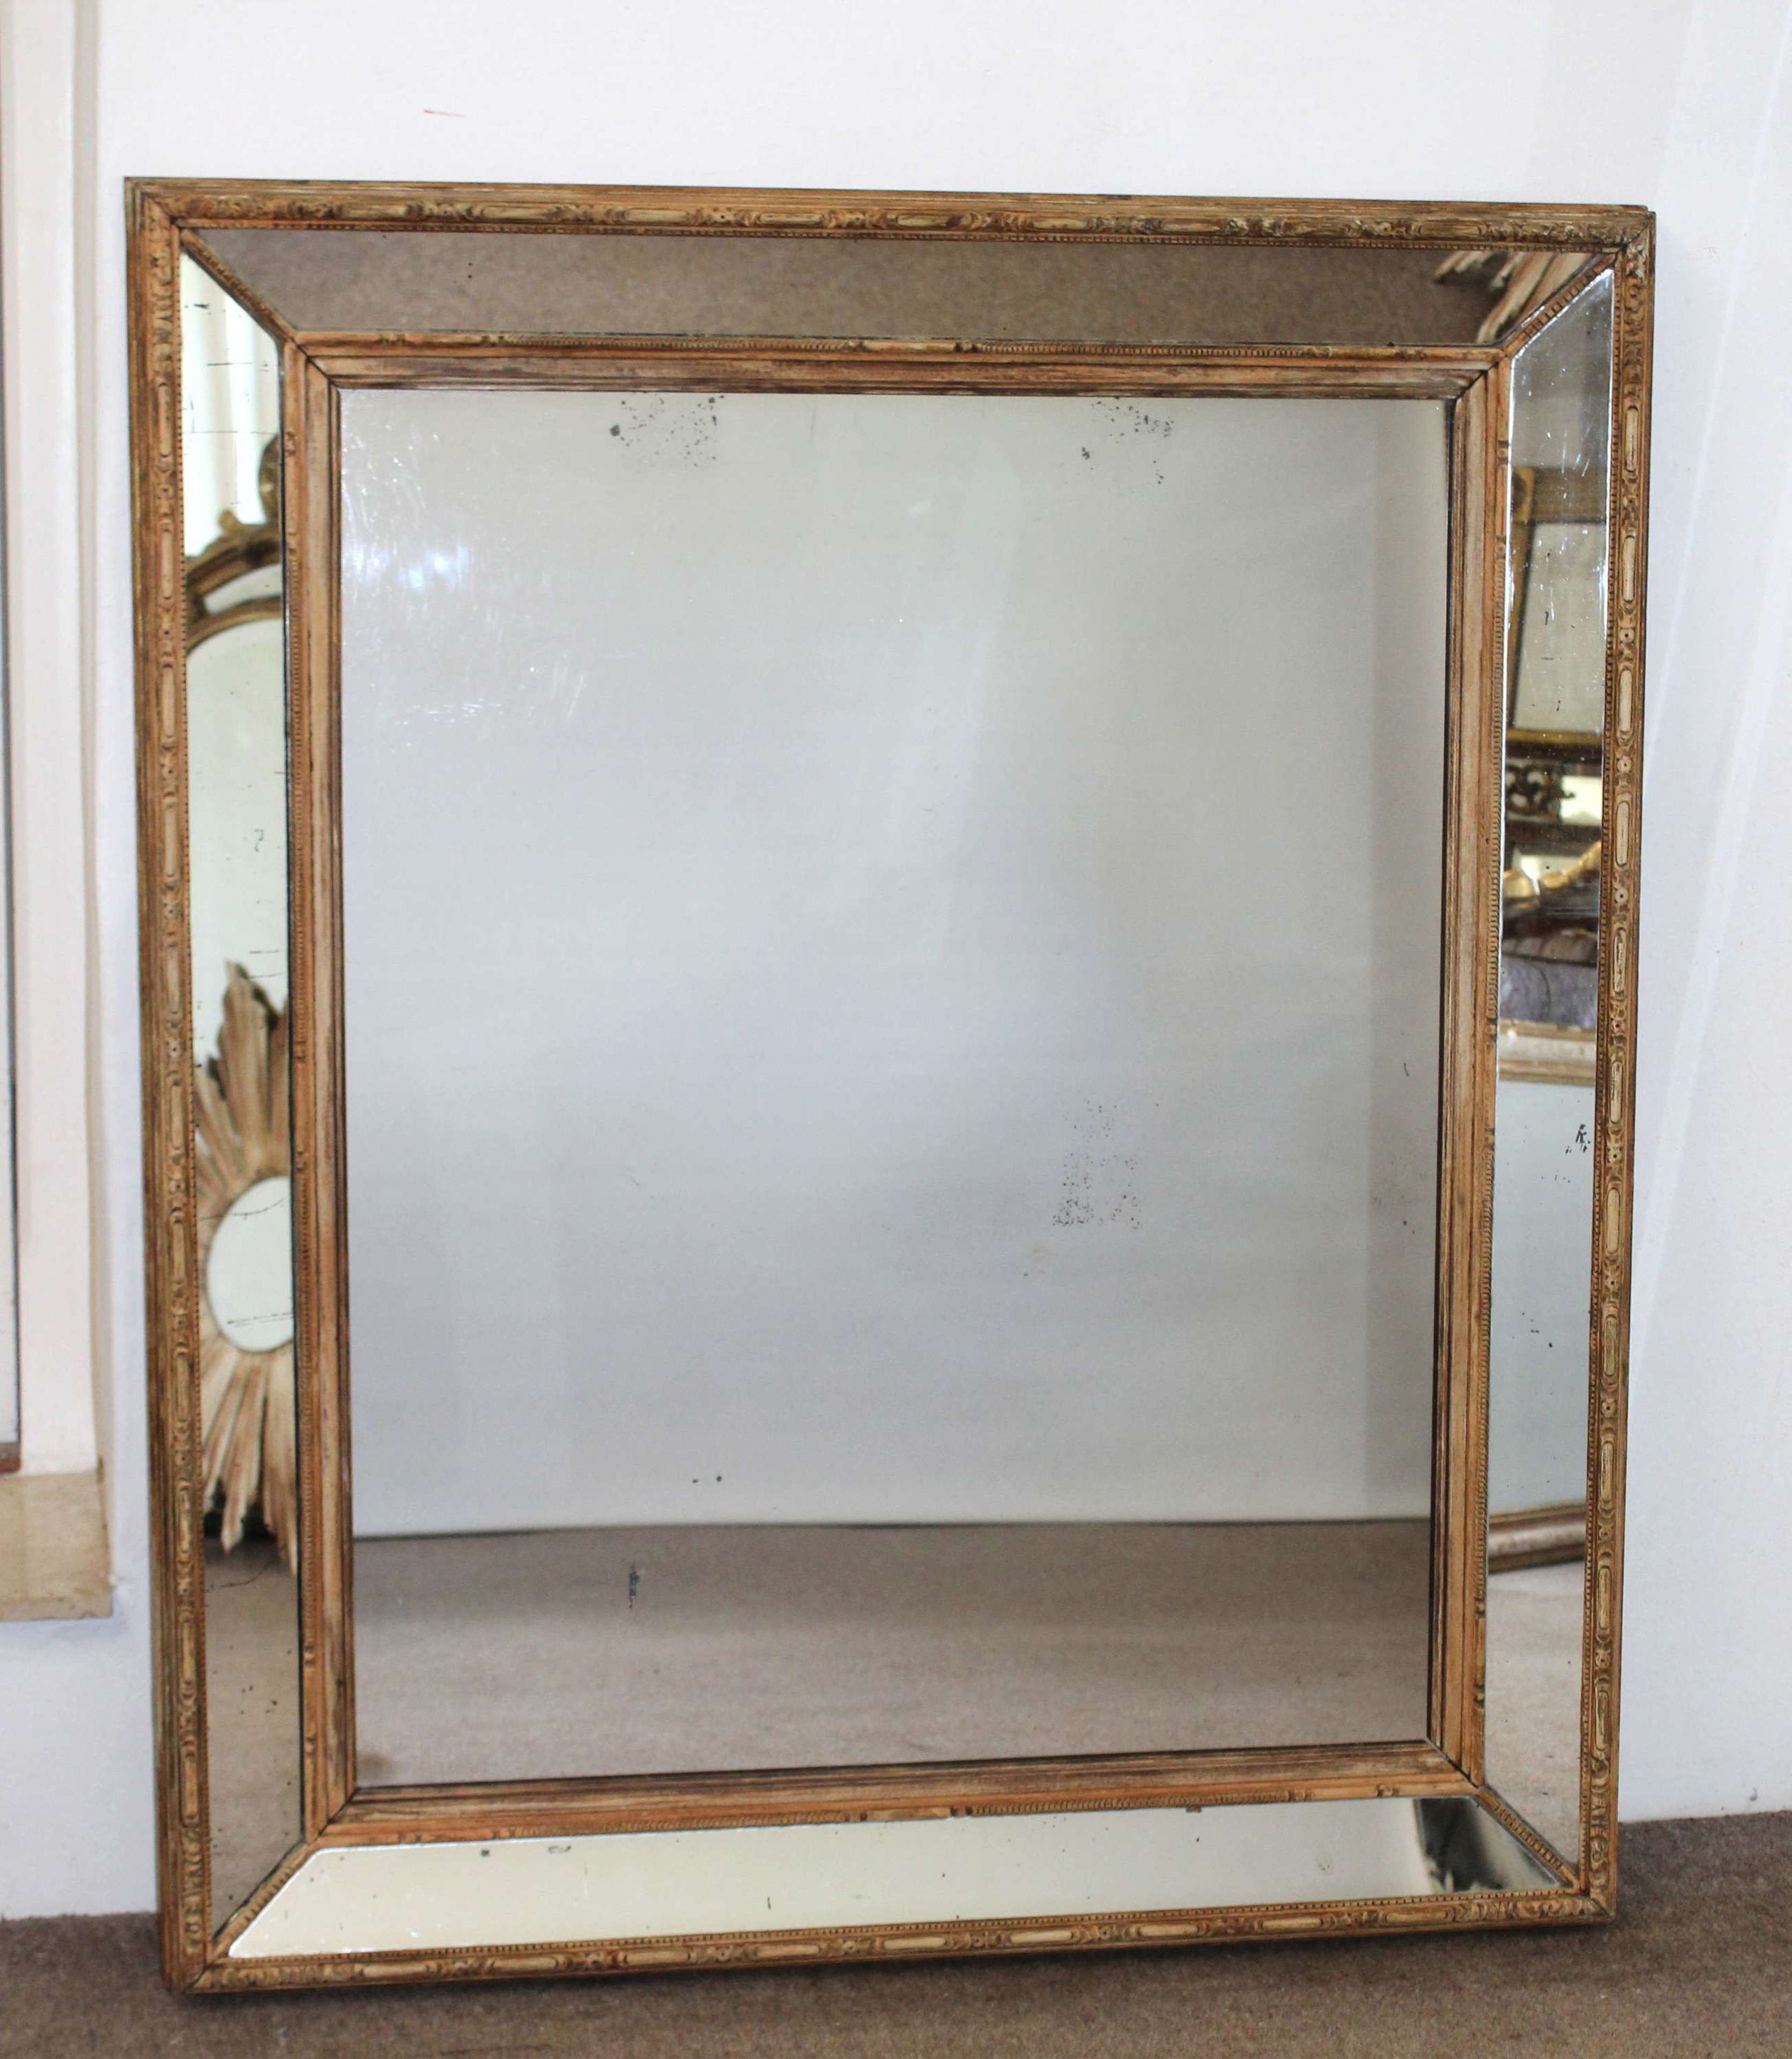 Large antique carved wood margin mirror